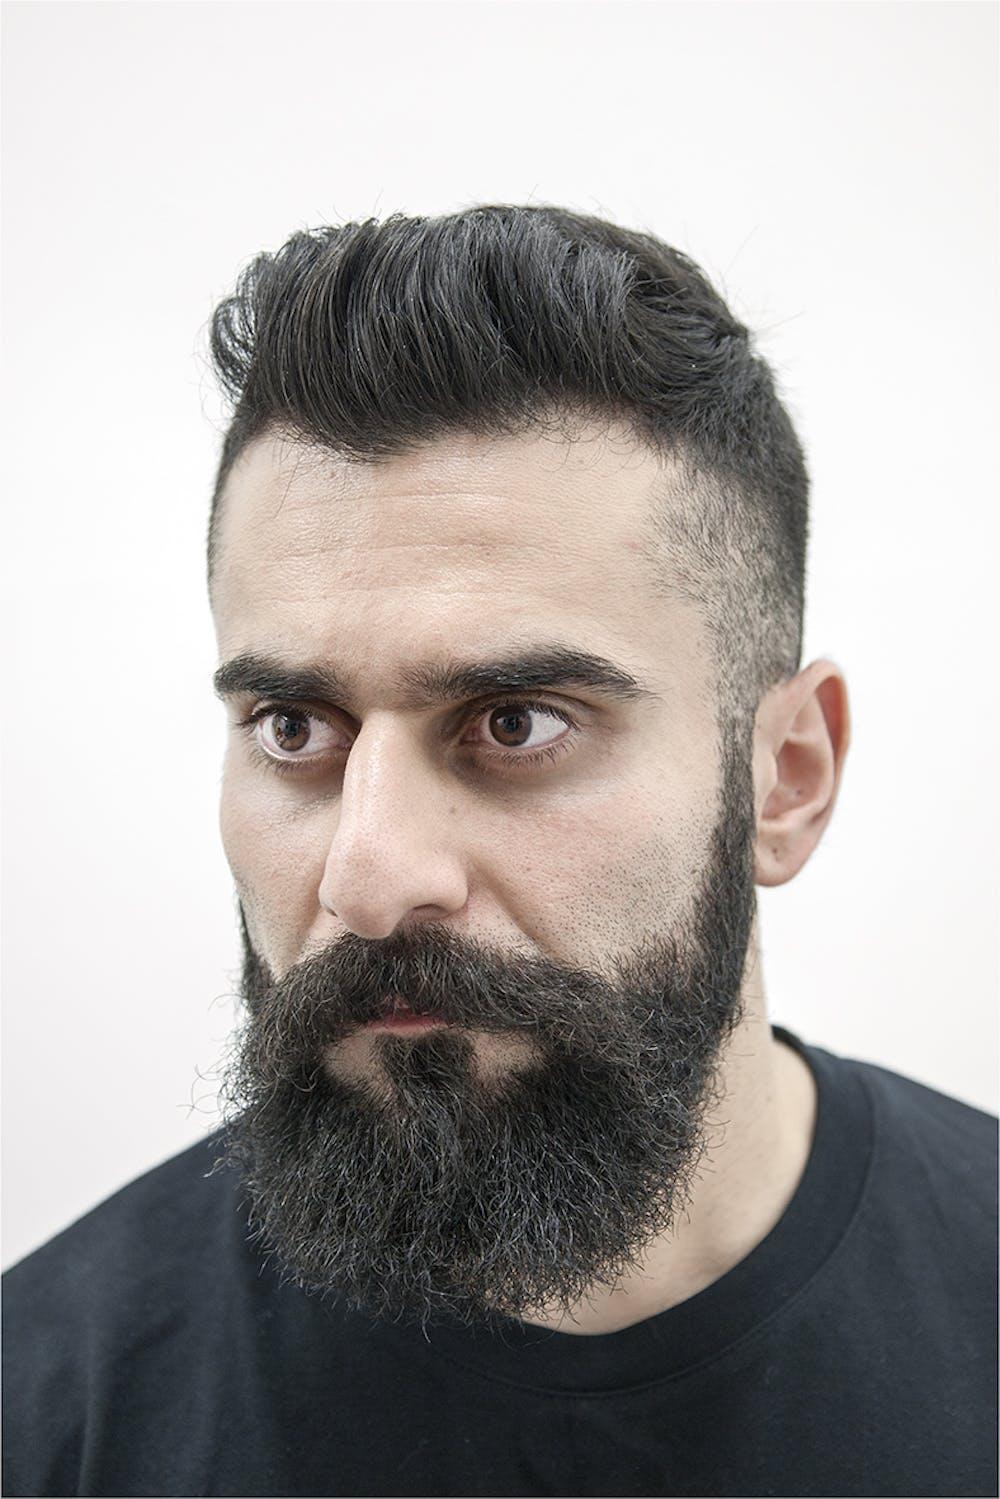 how to look like an arab man